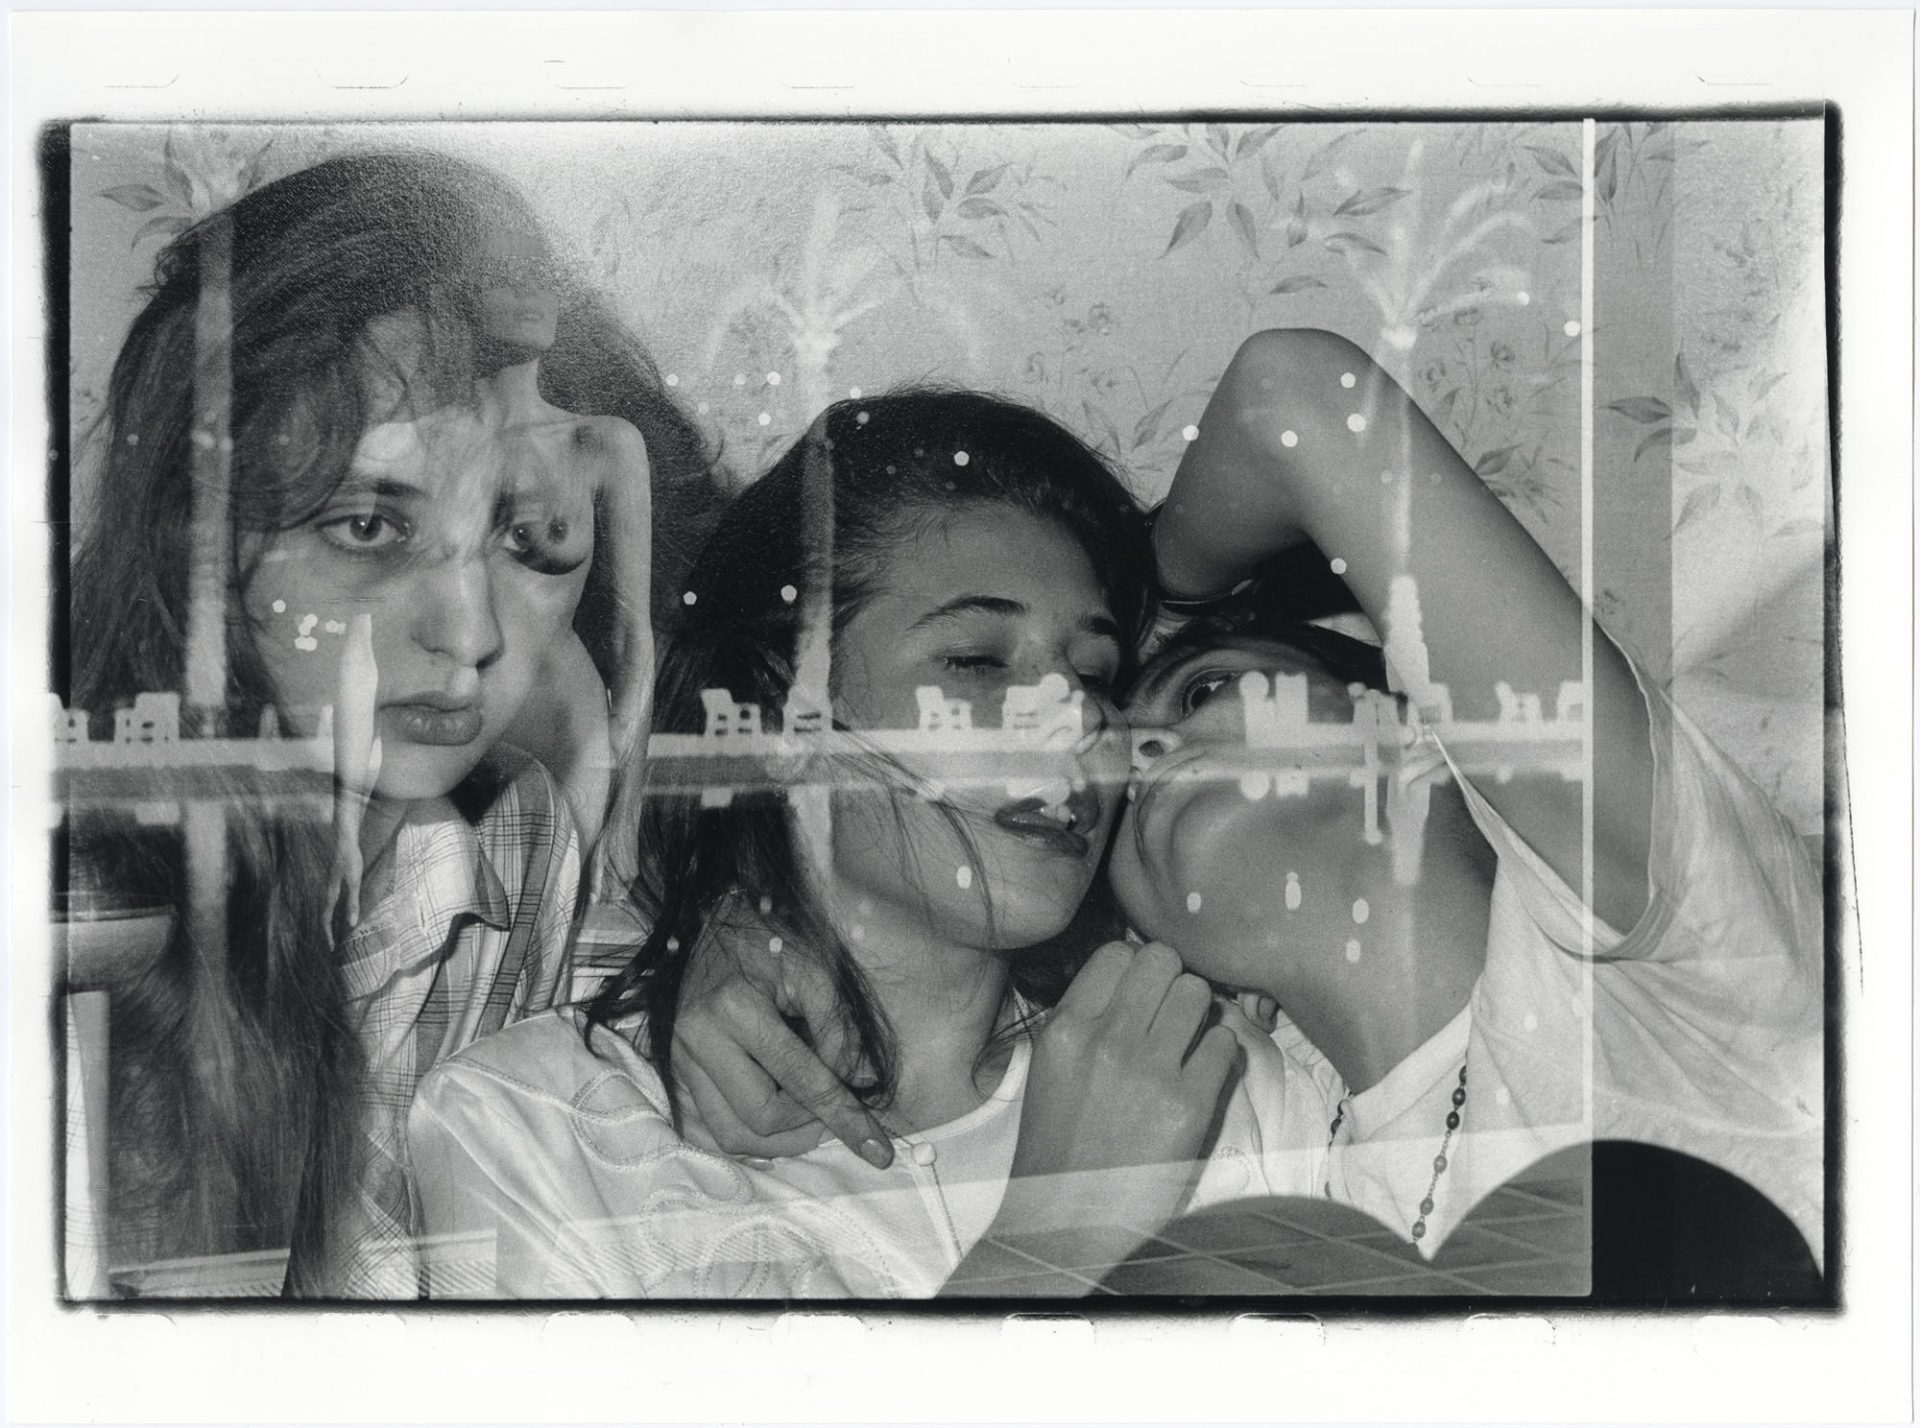 Bohdan Shumylovych. Photographic experimentation in Soviet Ukraine